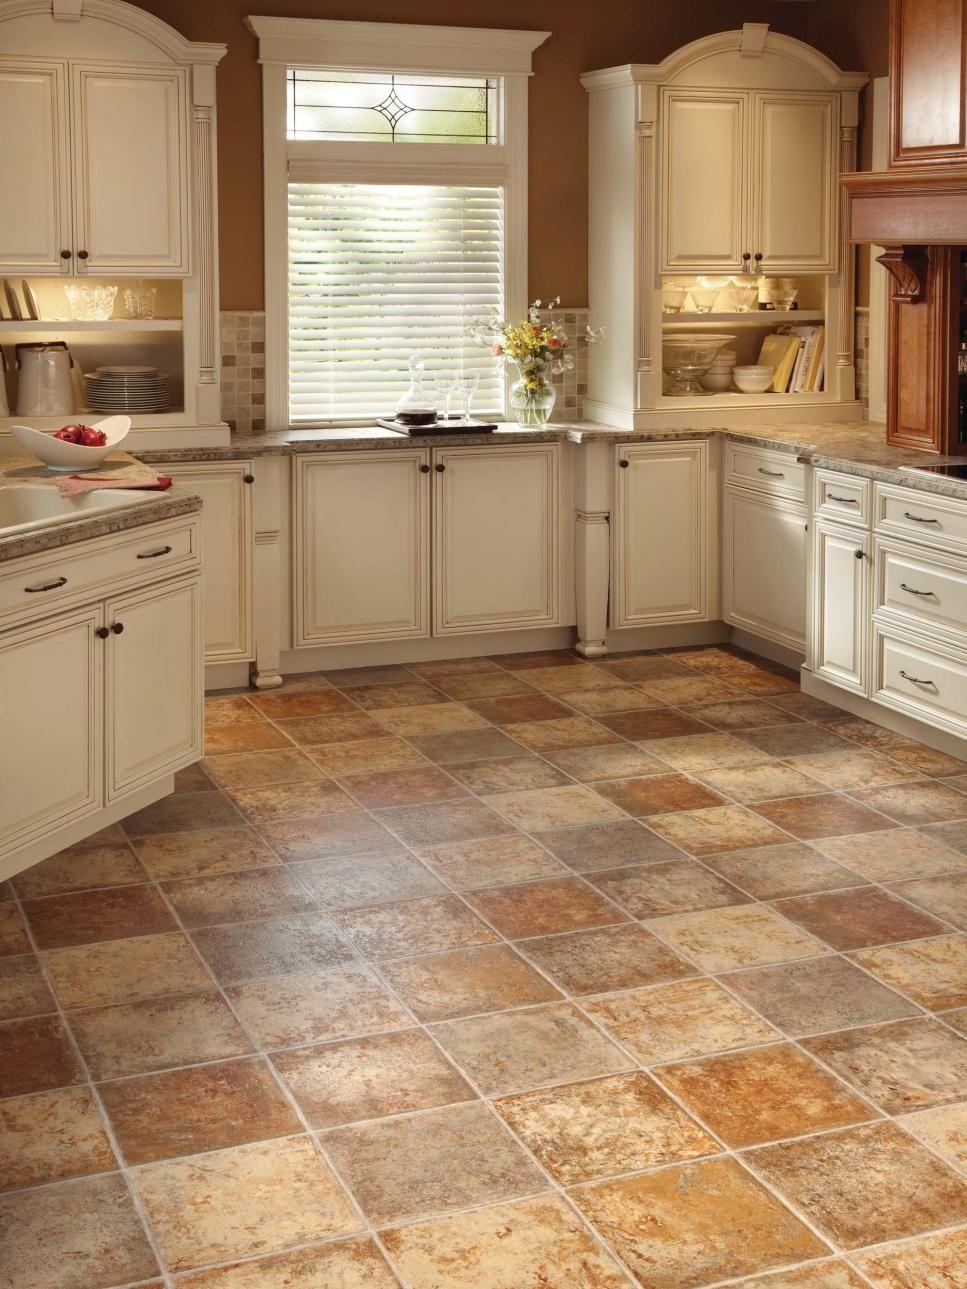 Choosing Tiles For Kitchen Floor & Choosing Tiles For Kitchen Floor | http://web4top.com/ | Pinterest ...